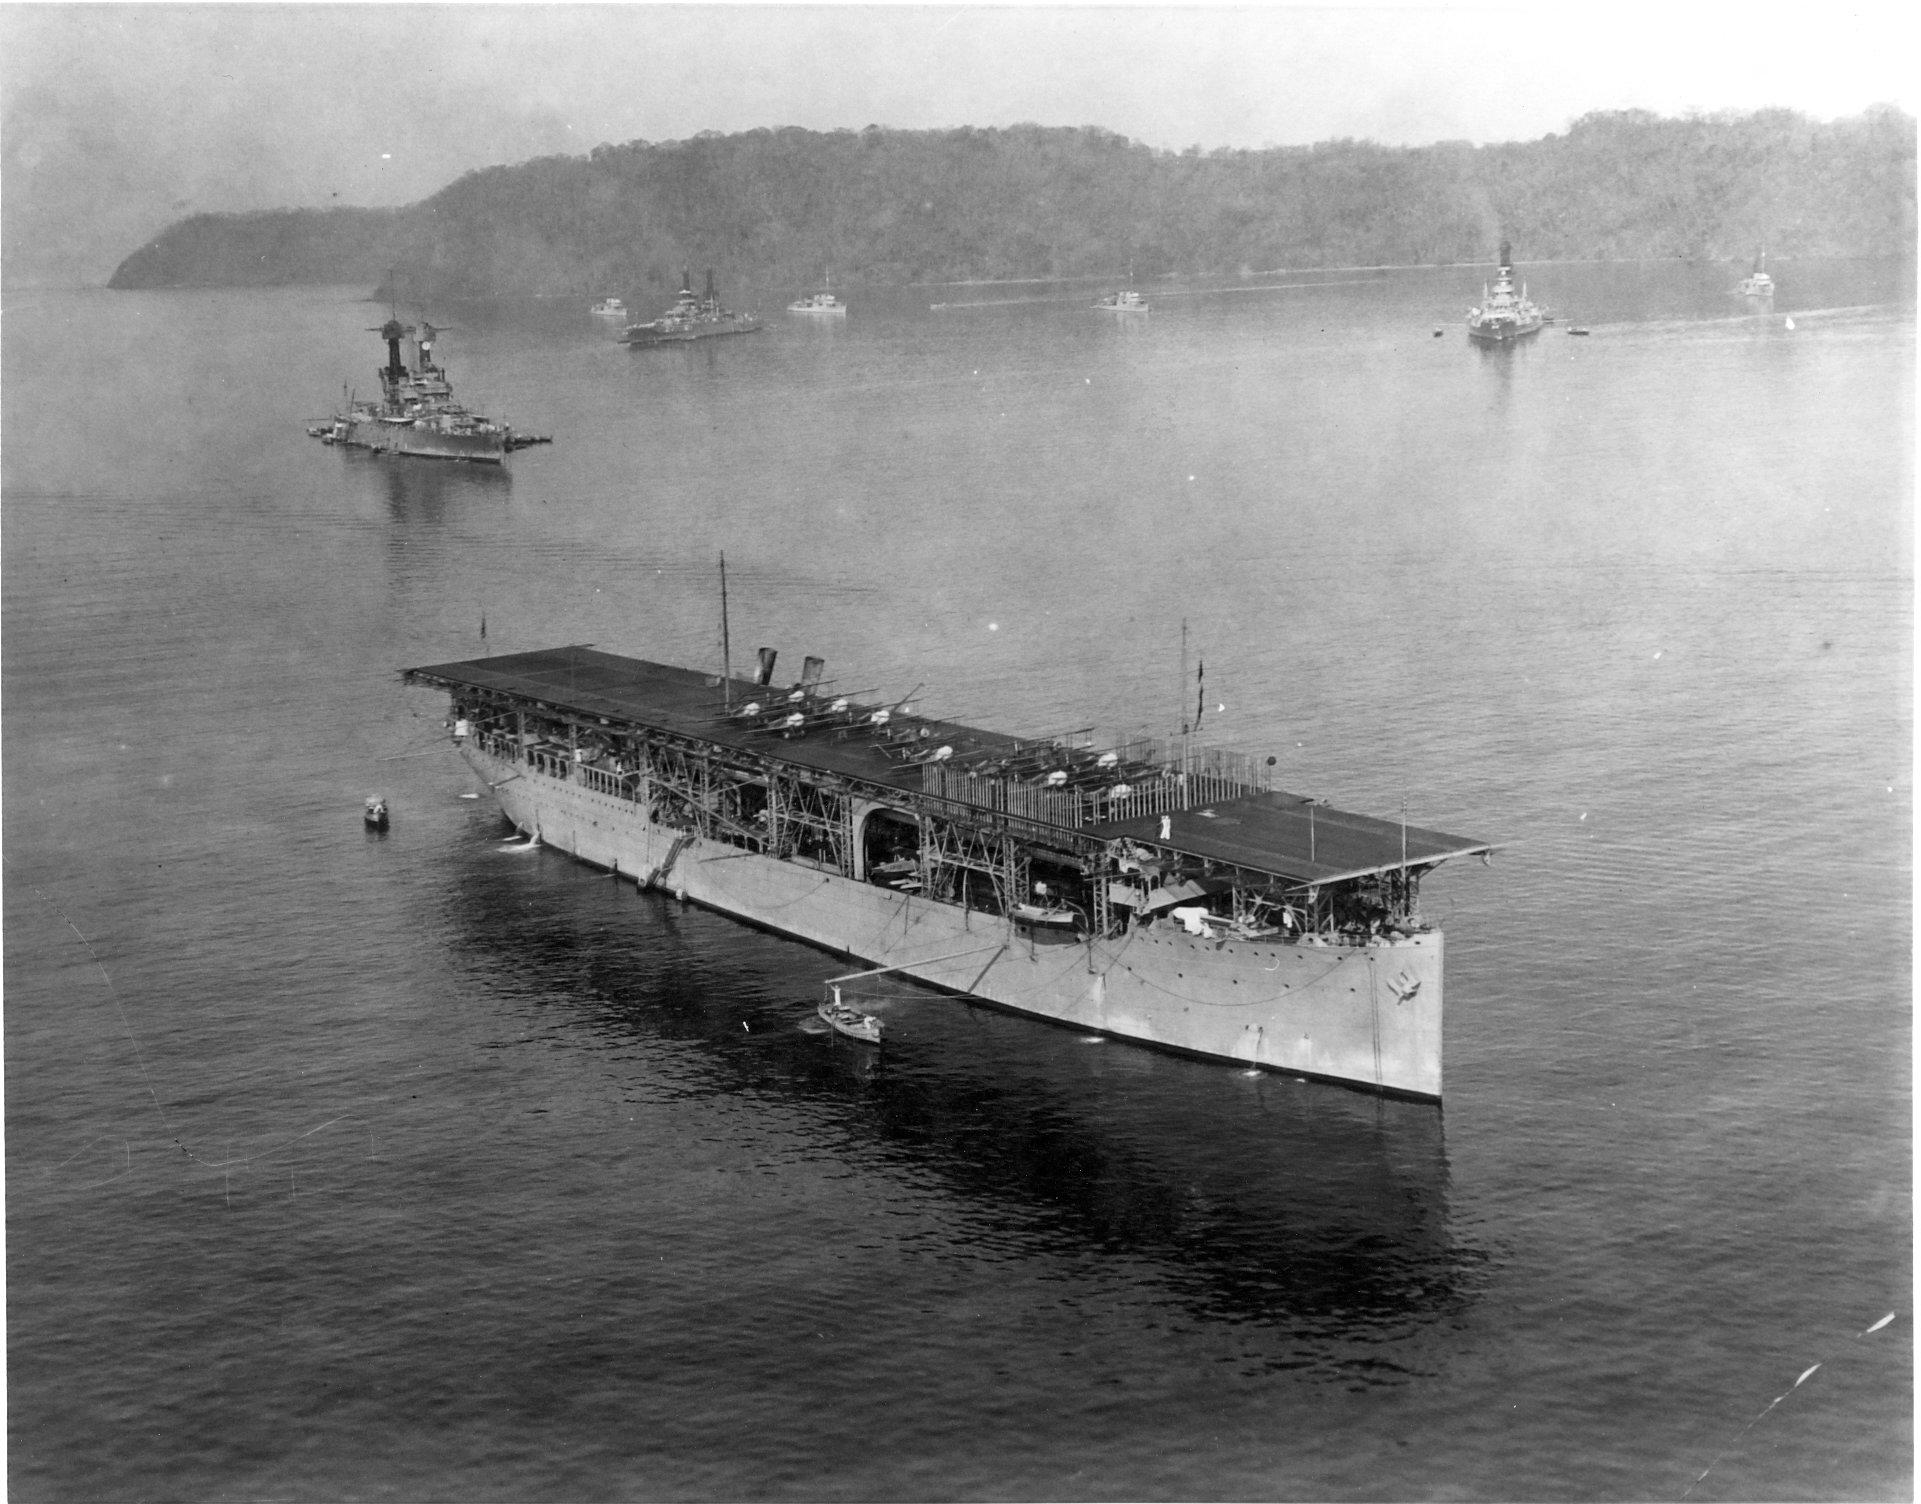 USS_Langley_CV-1_with_battlesips_1923.jpg